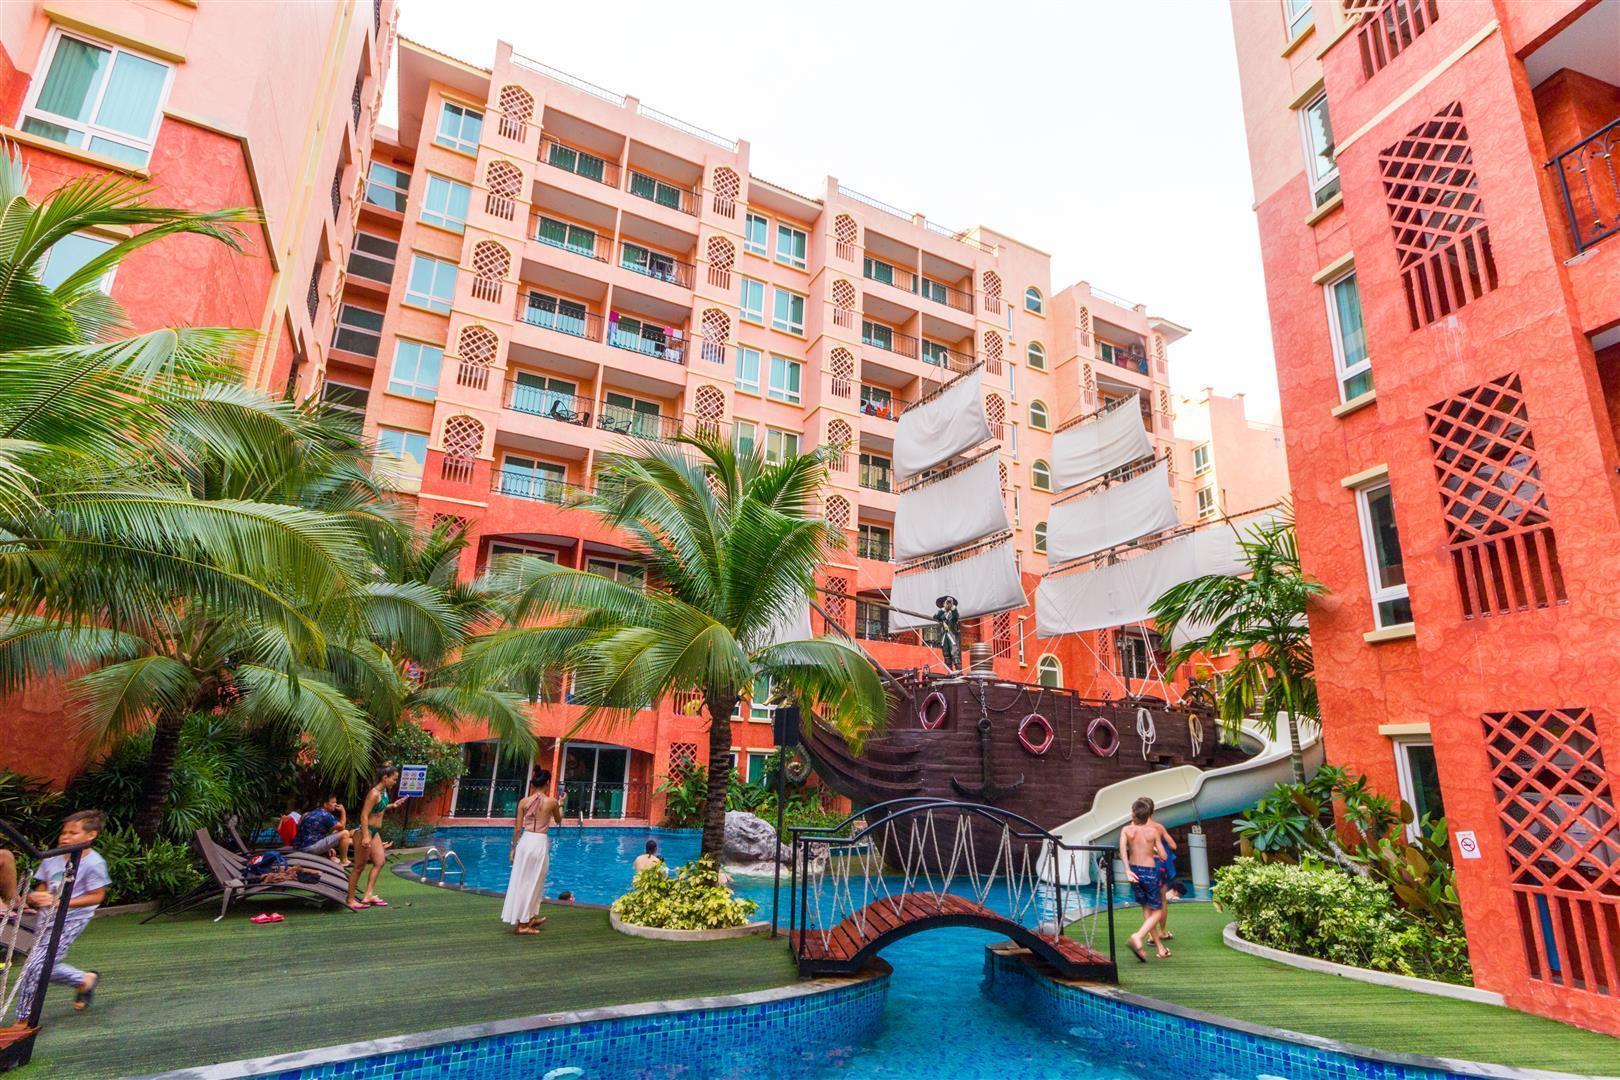 Seven Sea Resort Pattaya A516 อพาร์ตเมนต์ 1 ห้องนอน 1 ห้องน้ำส่วนตัว ขนาด 37 ตร.ม. – หาดจอมเทียน